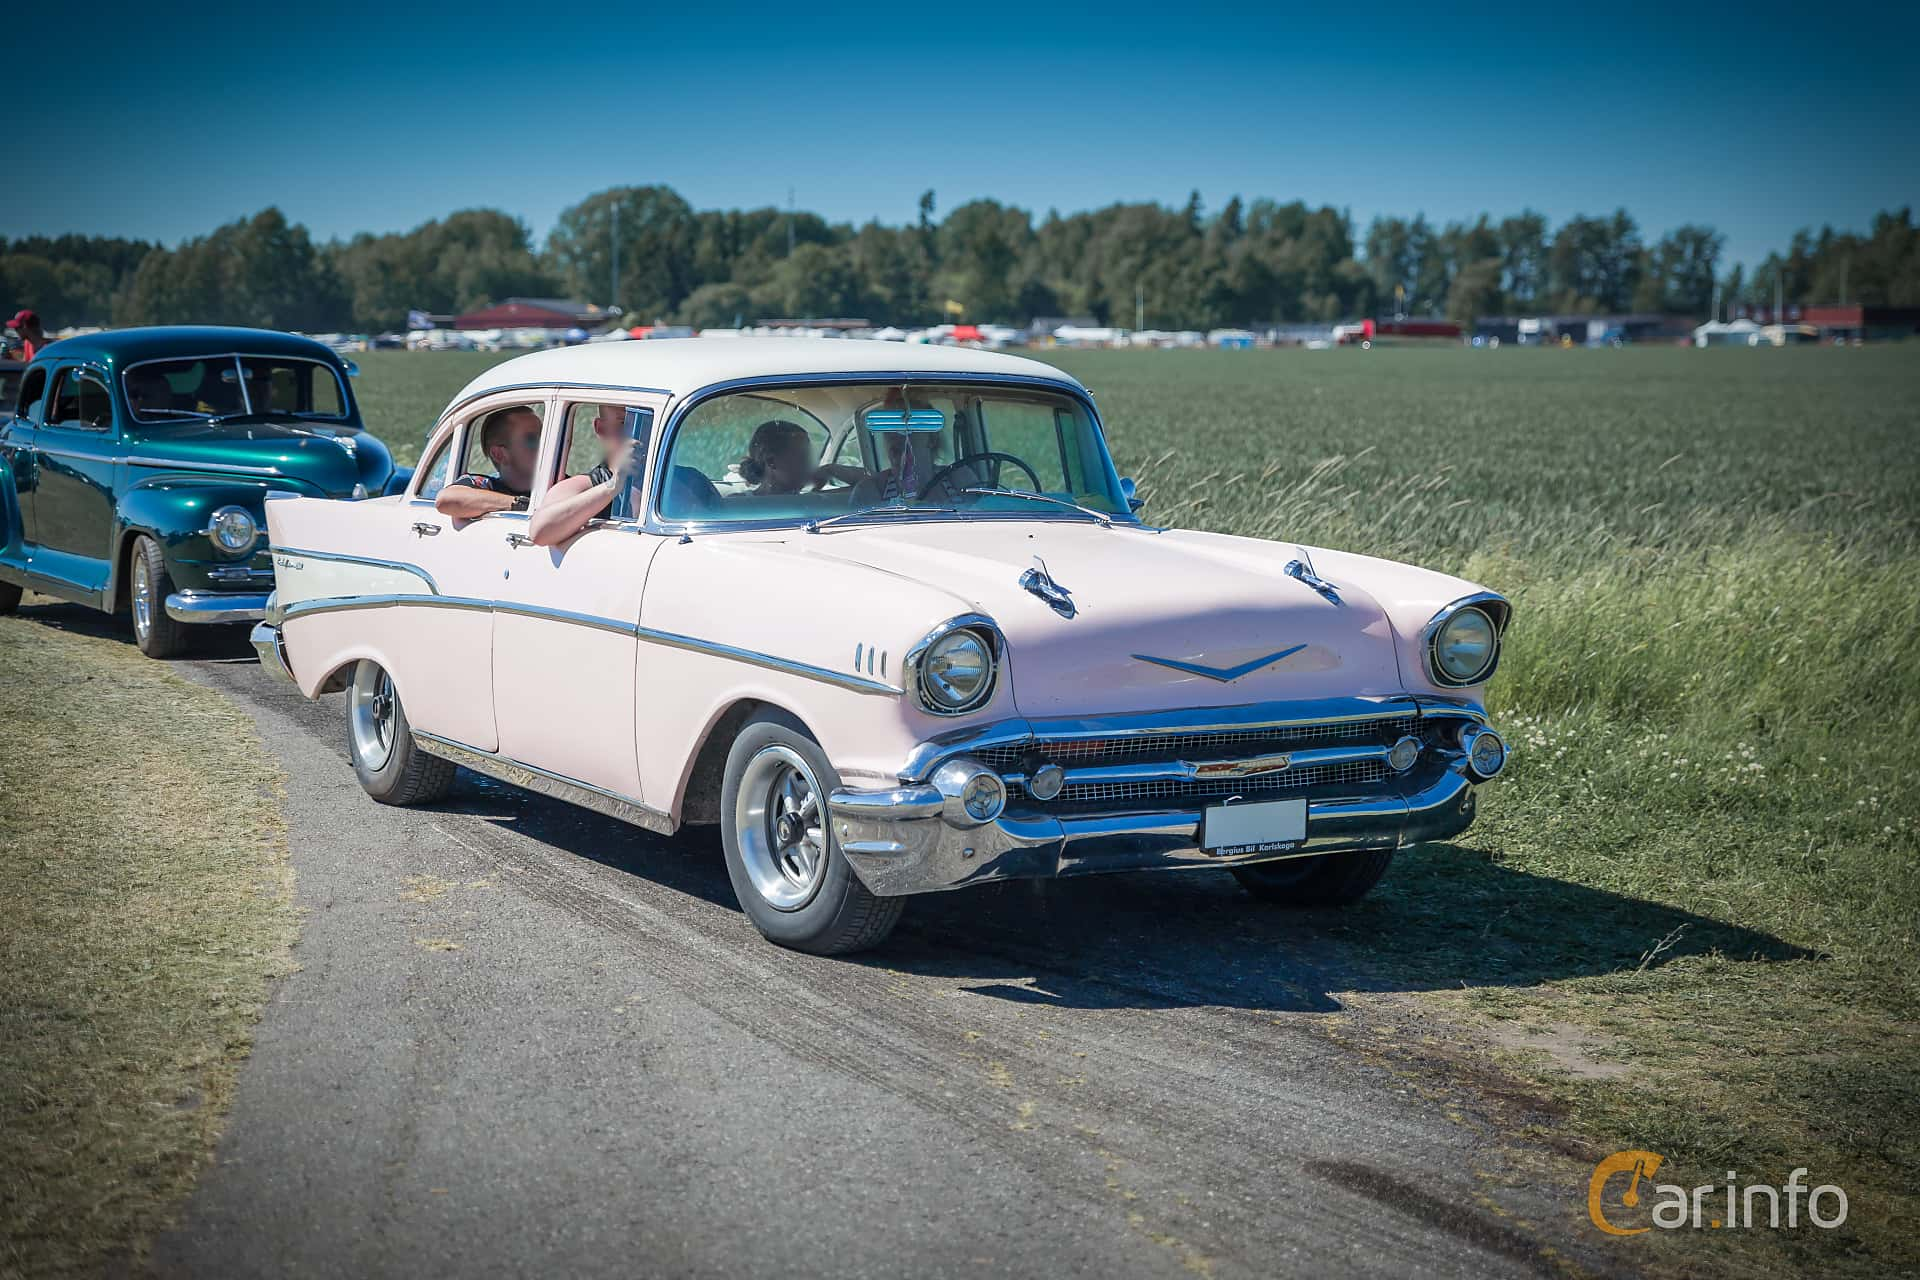 Tagen P Power Big Meet 2015 1957 Chevy Bel Air Hardtop 4 Door Chevrolet Sedan 43 V8 Manual 165hp At